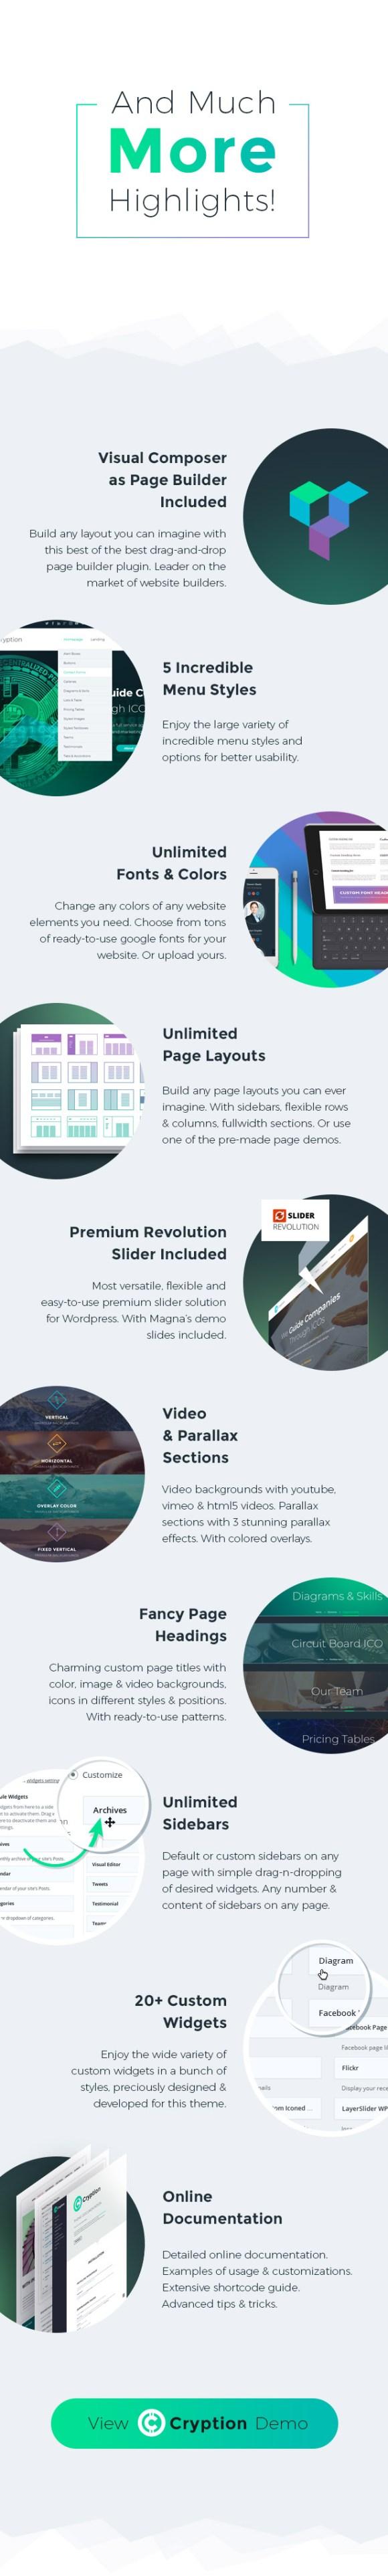 Cryption - ICO, Cryptocurrency & Blockchain WordPress Theme - 4